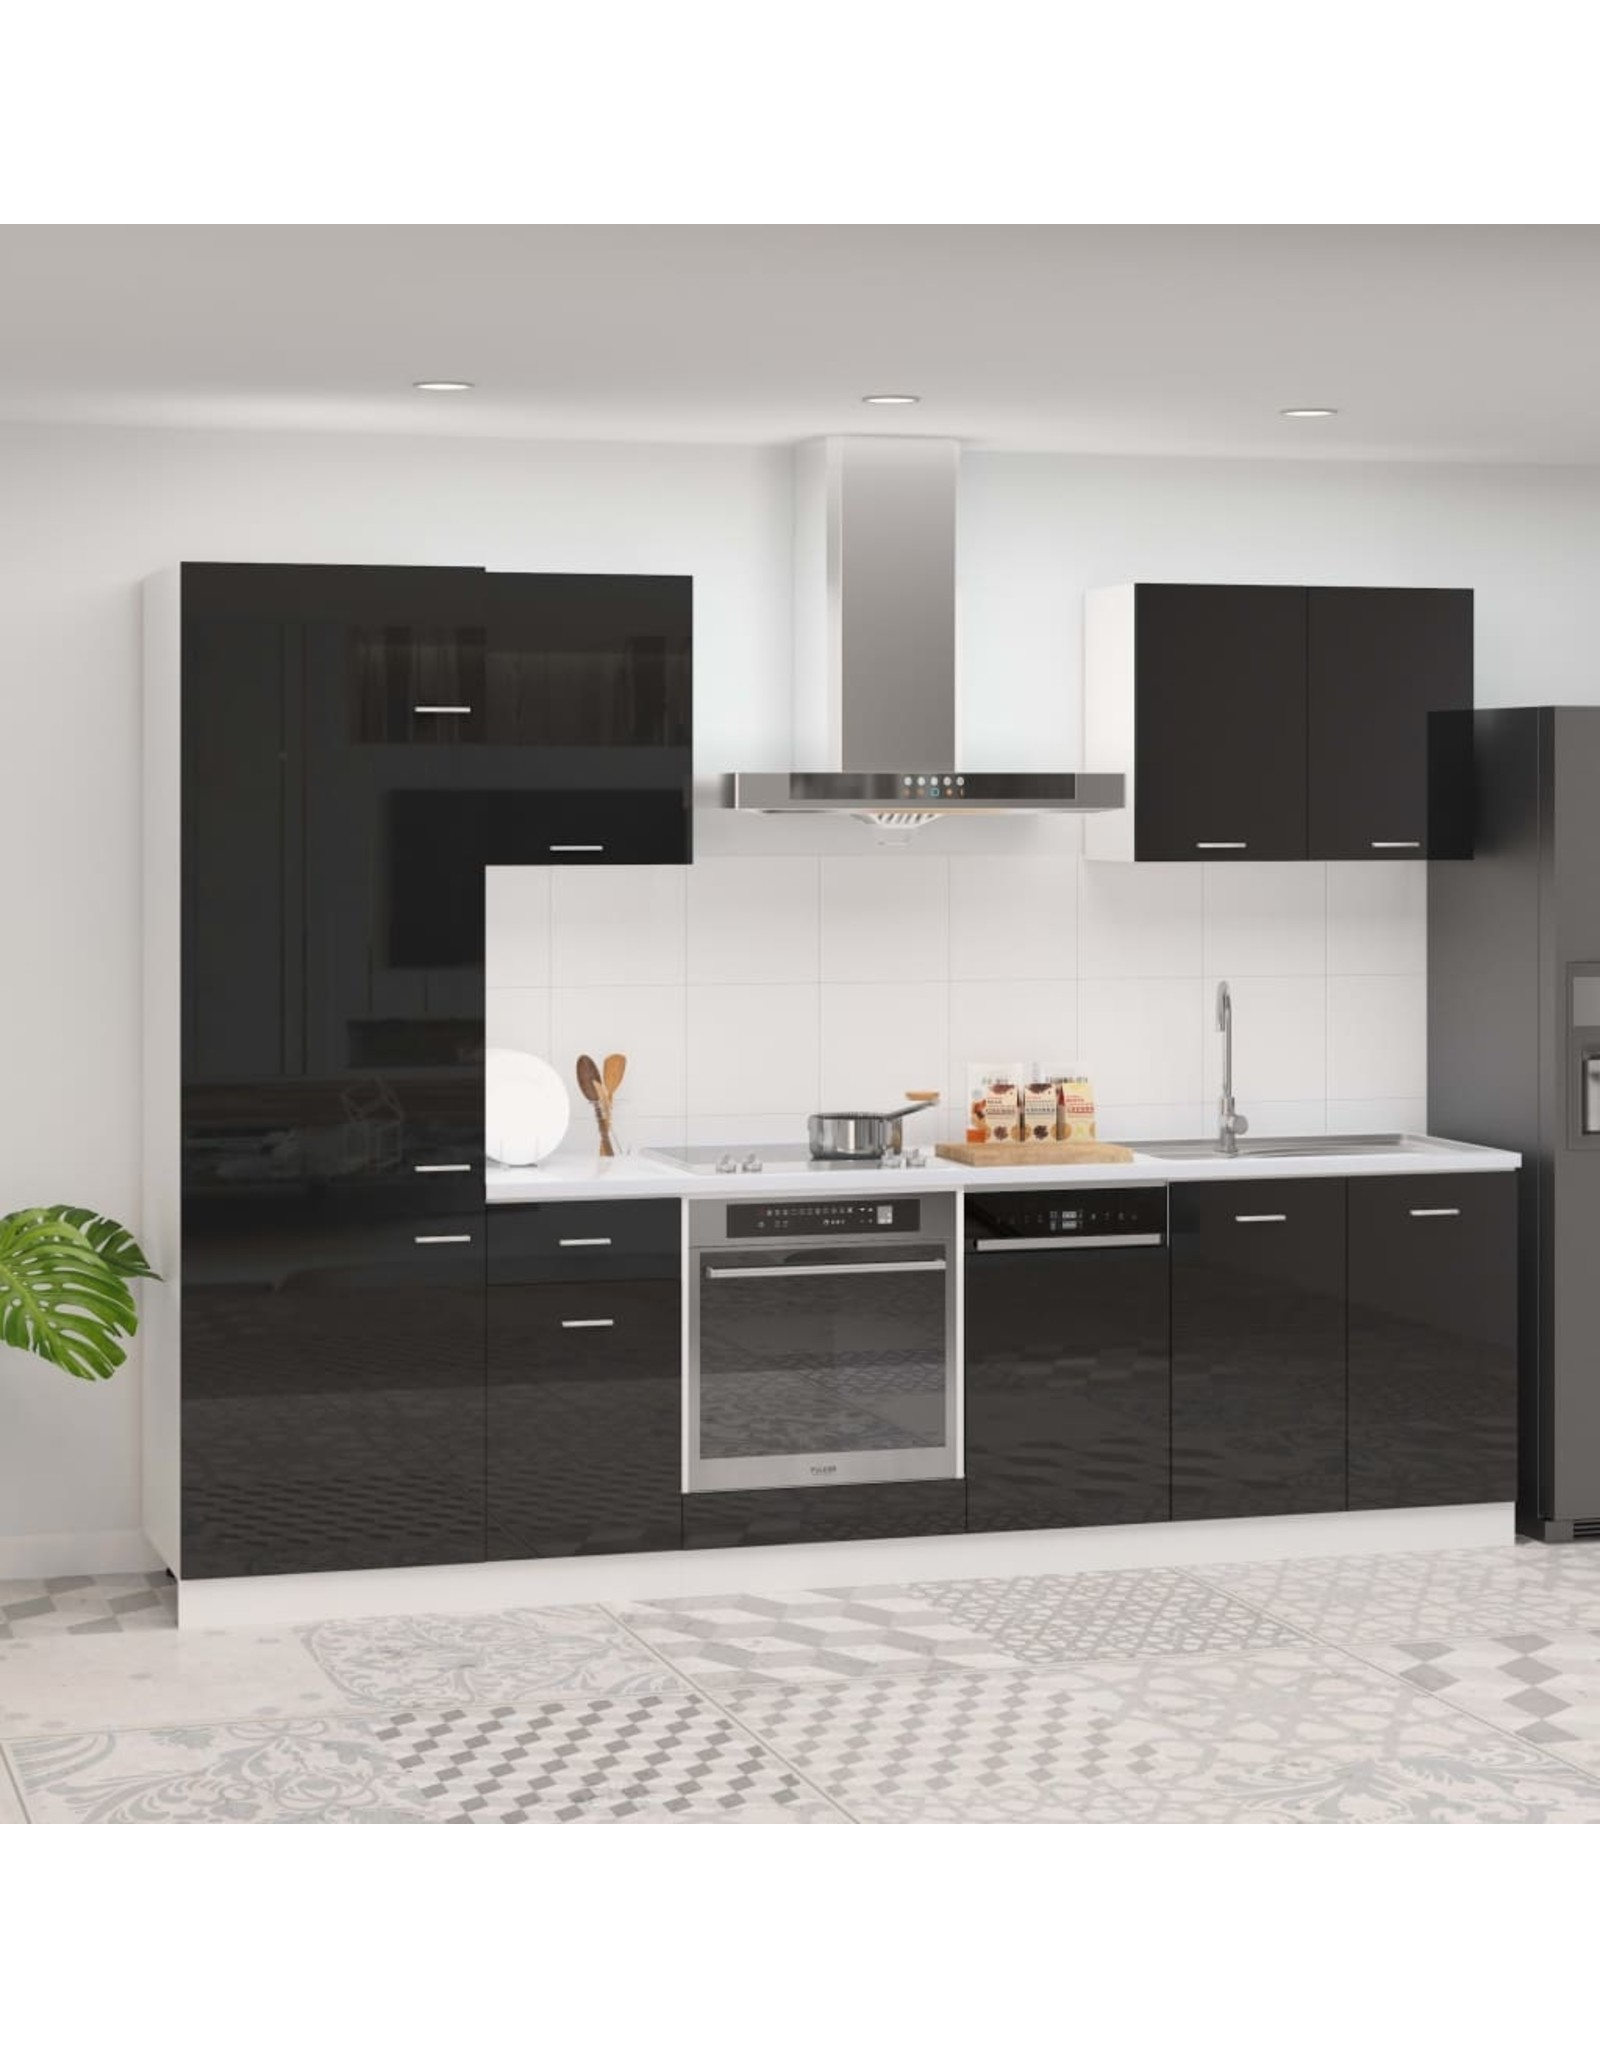 7-delige Keukenkastenset spaanplaat hoogglans zwart